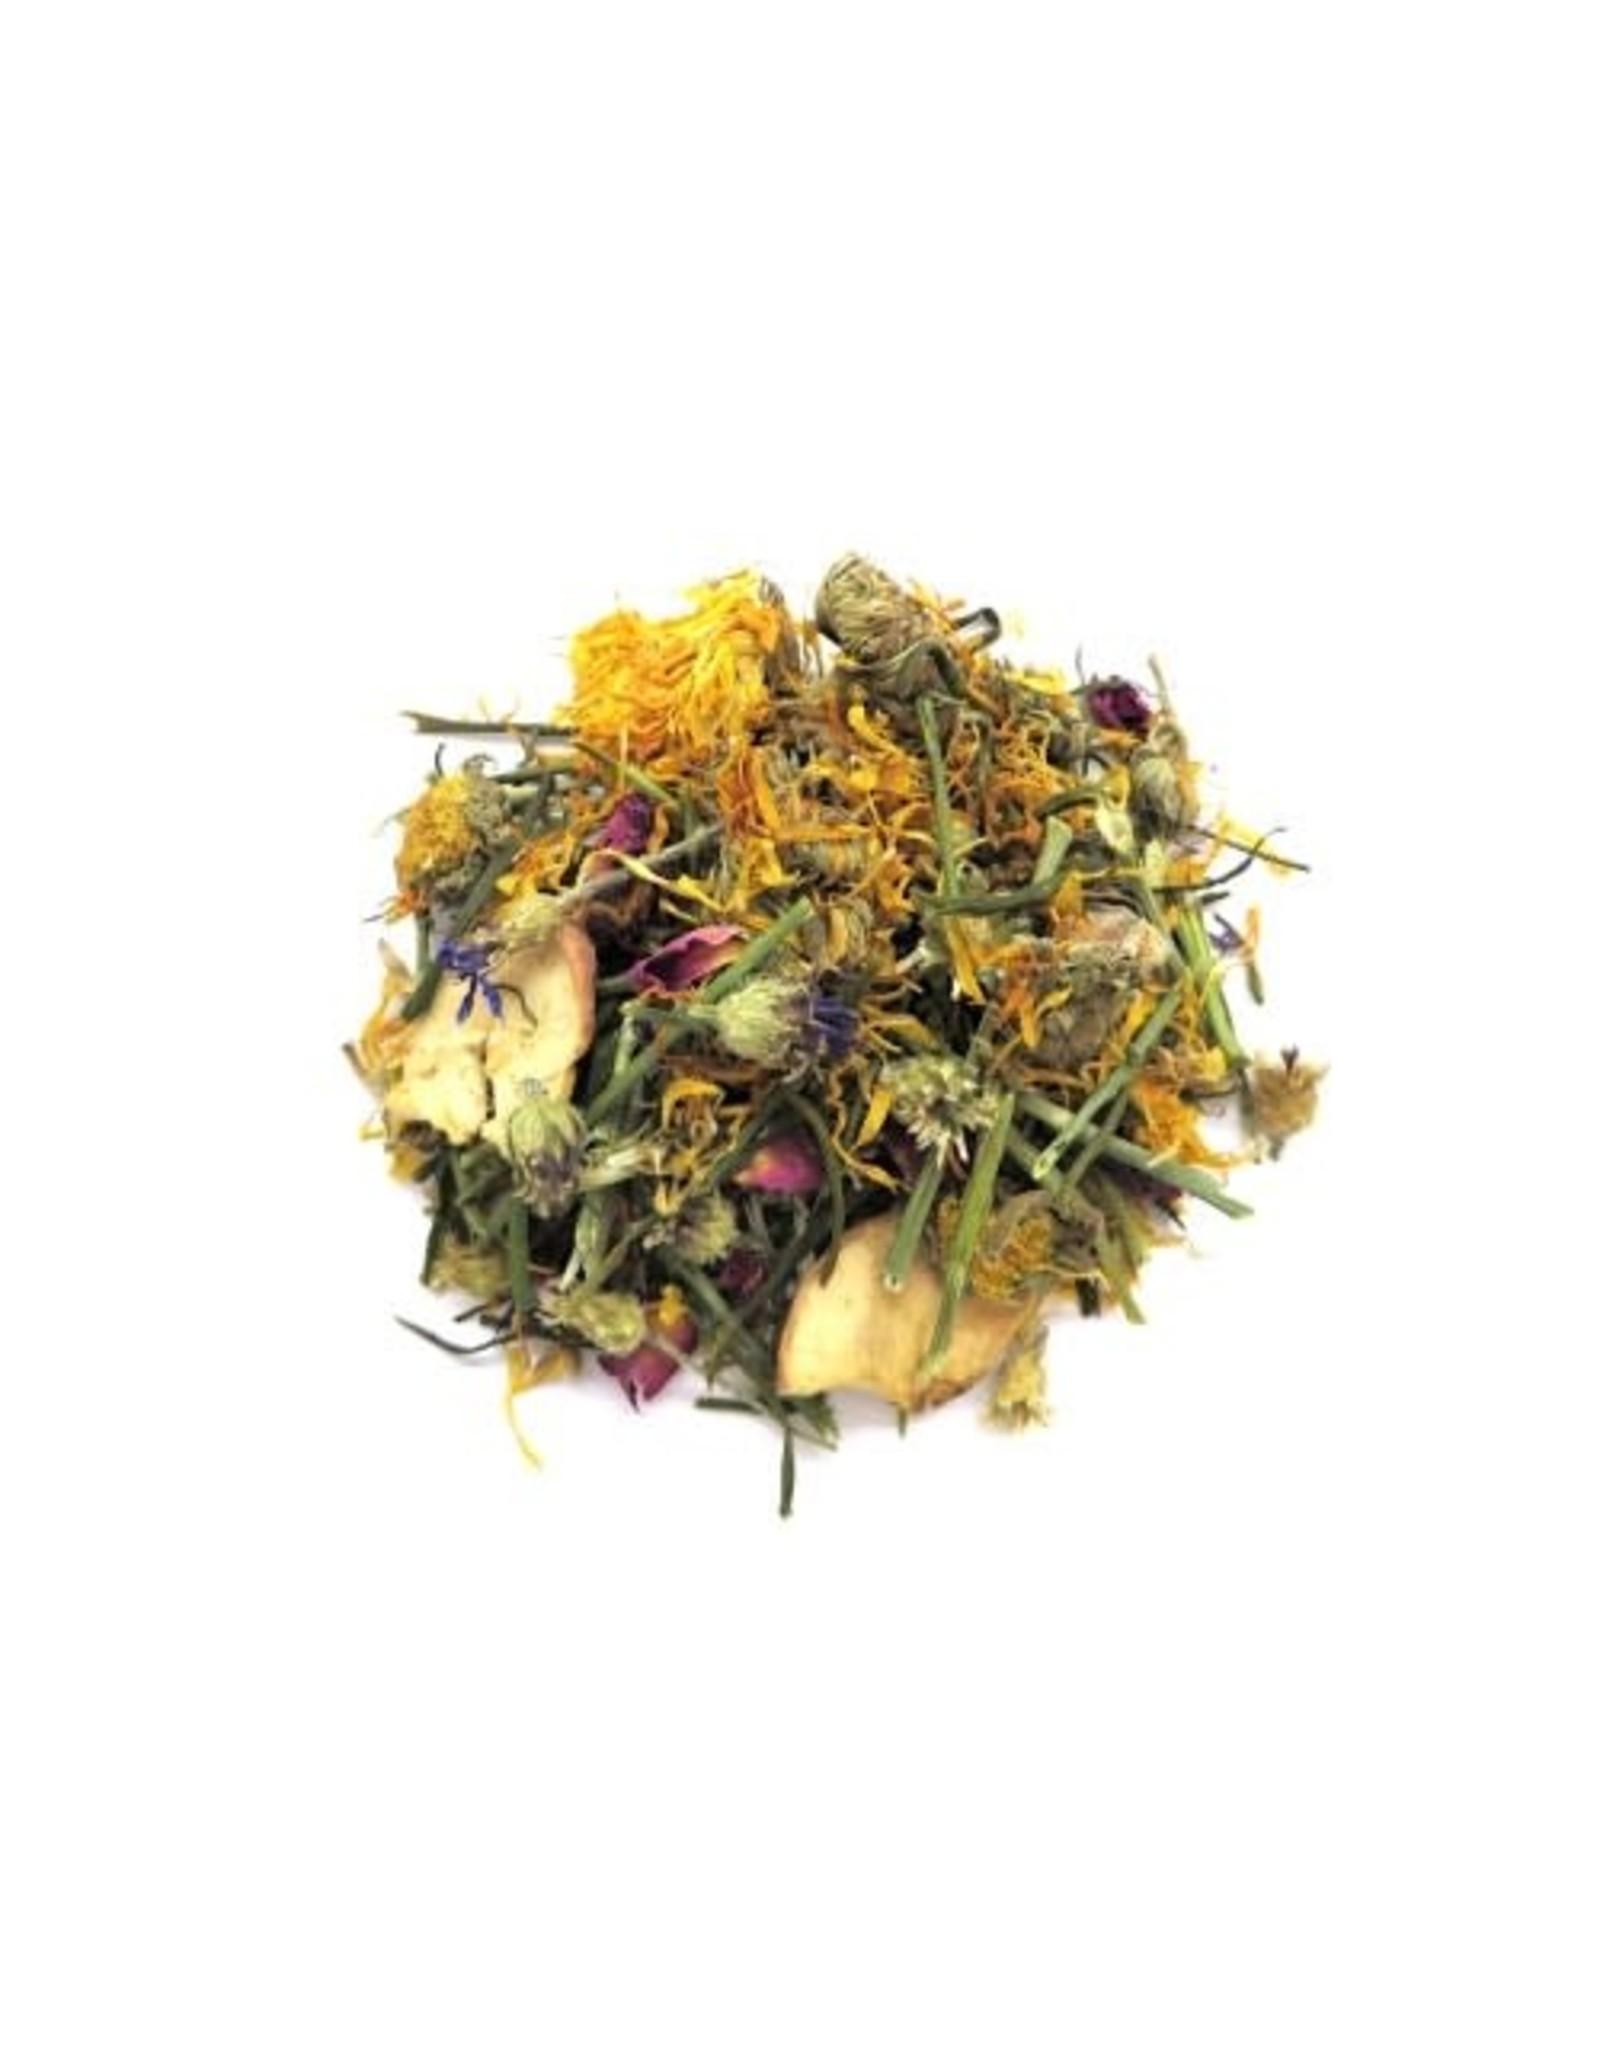 Borders Complete Small Animal Mix Flower Power - rose flower, marigold, bluecorn flowers, apple chips, dill stalks 70g